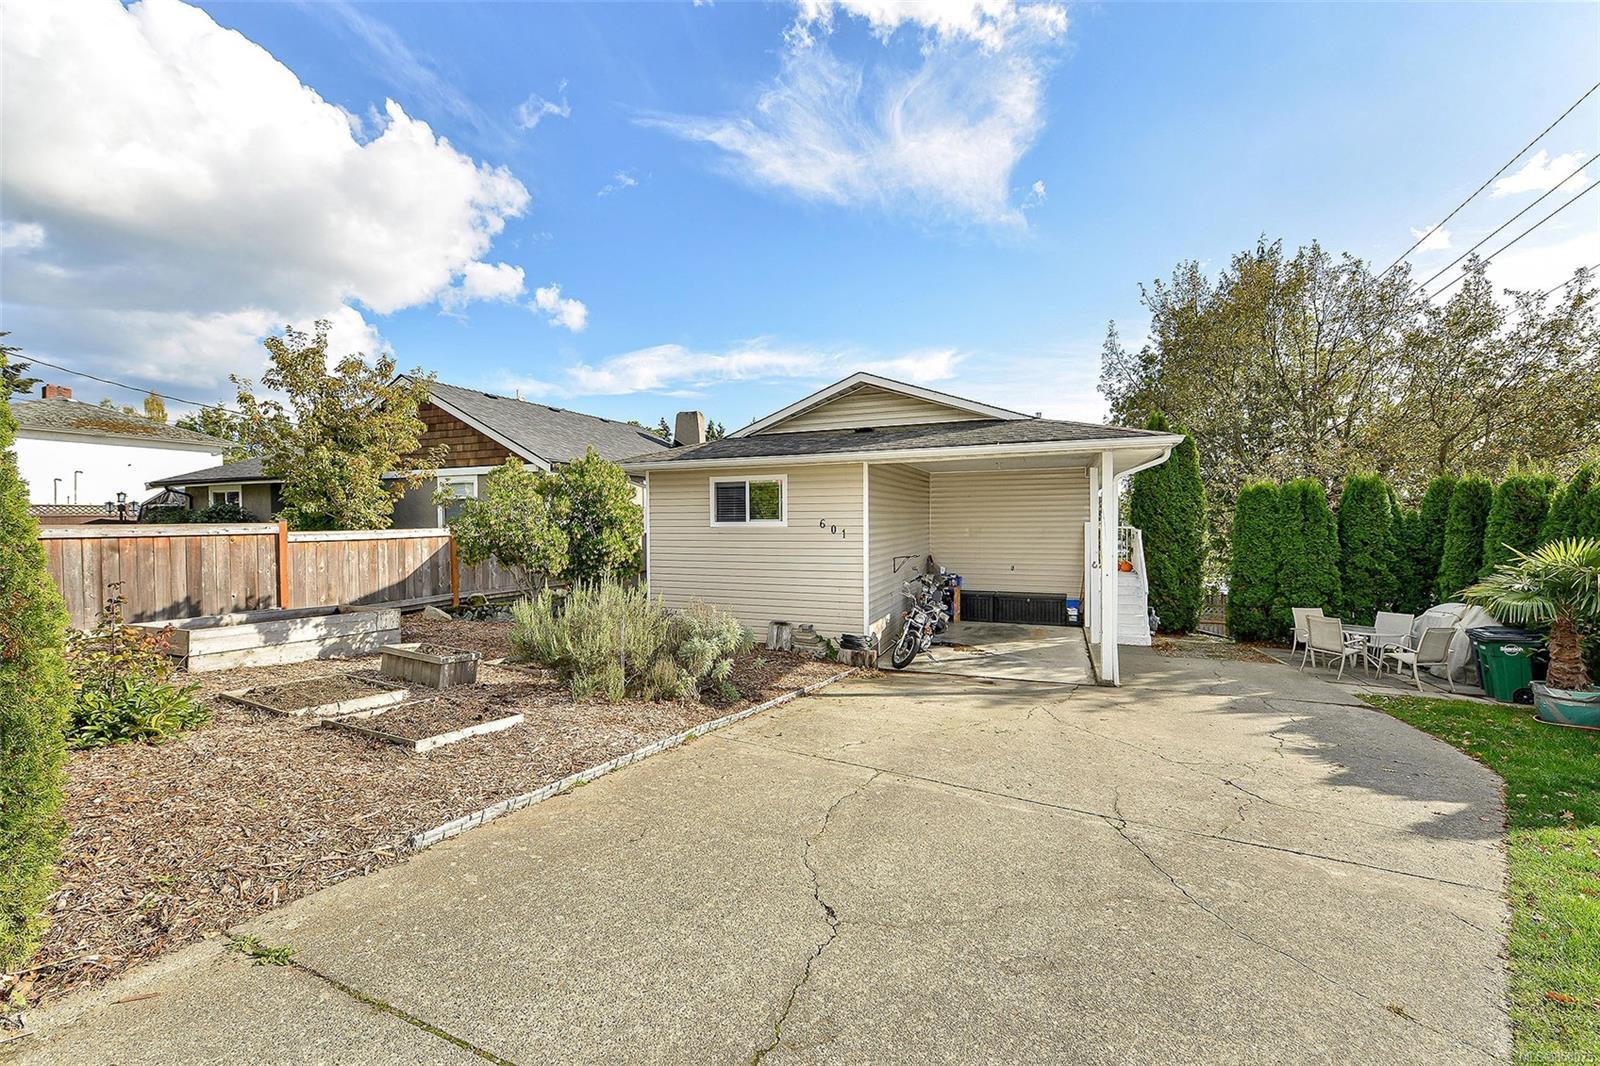 Main Photo: 601 Judah St in : SW Glanford House for sale (Saanich West)  : MLS®# 858075